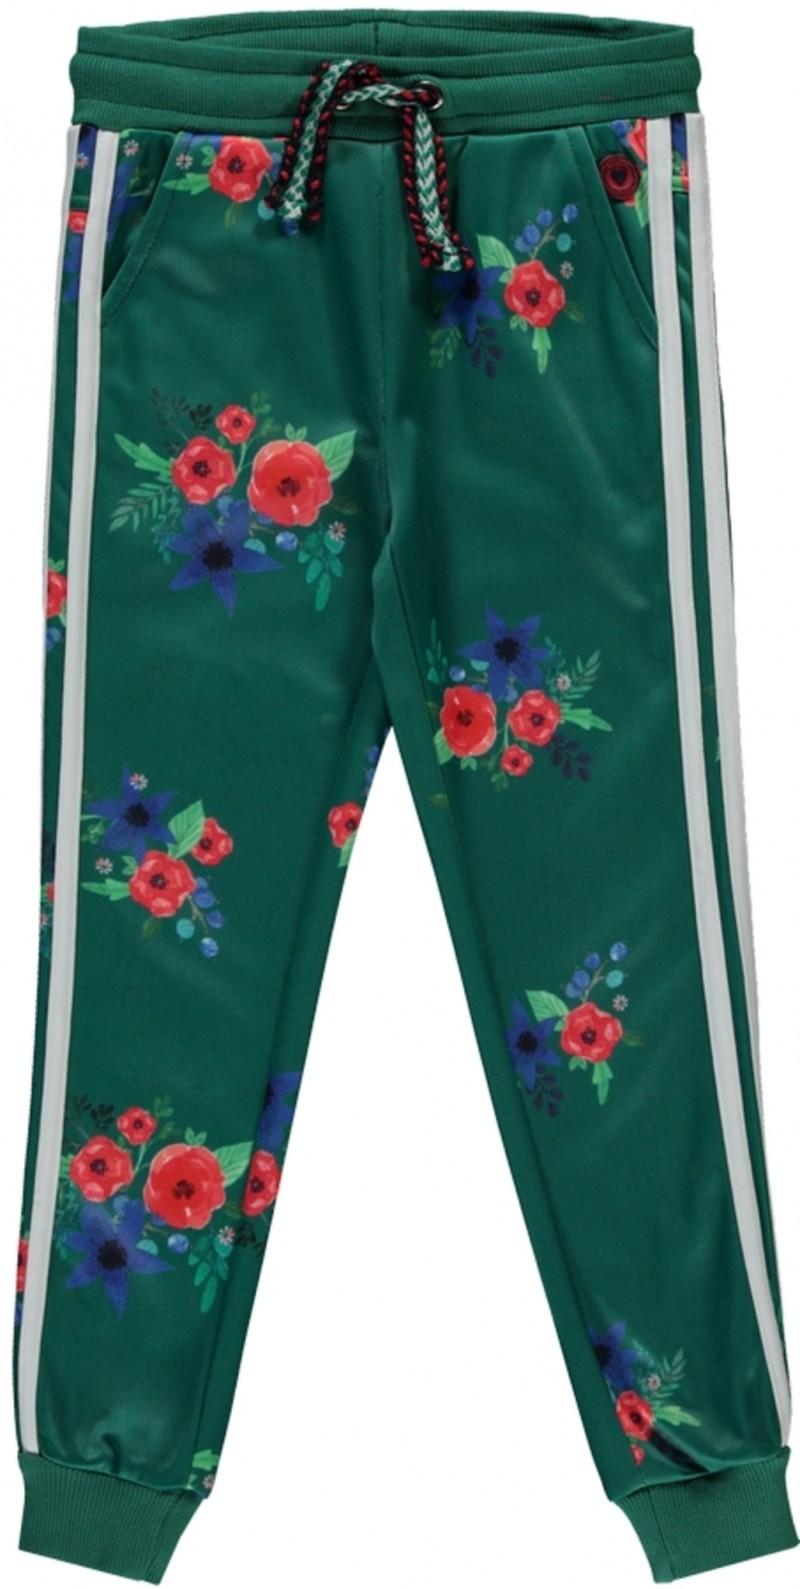 https://myshop.s3-external-3.amazonaws.com/shop3044400.pictures.quapi-tiske-forest-green-flower.jpg